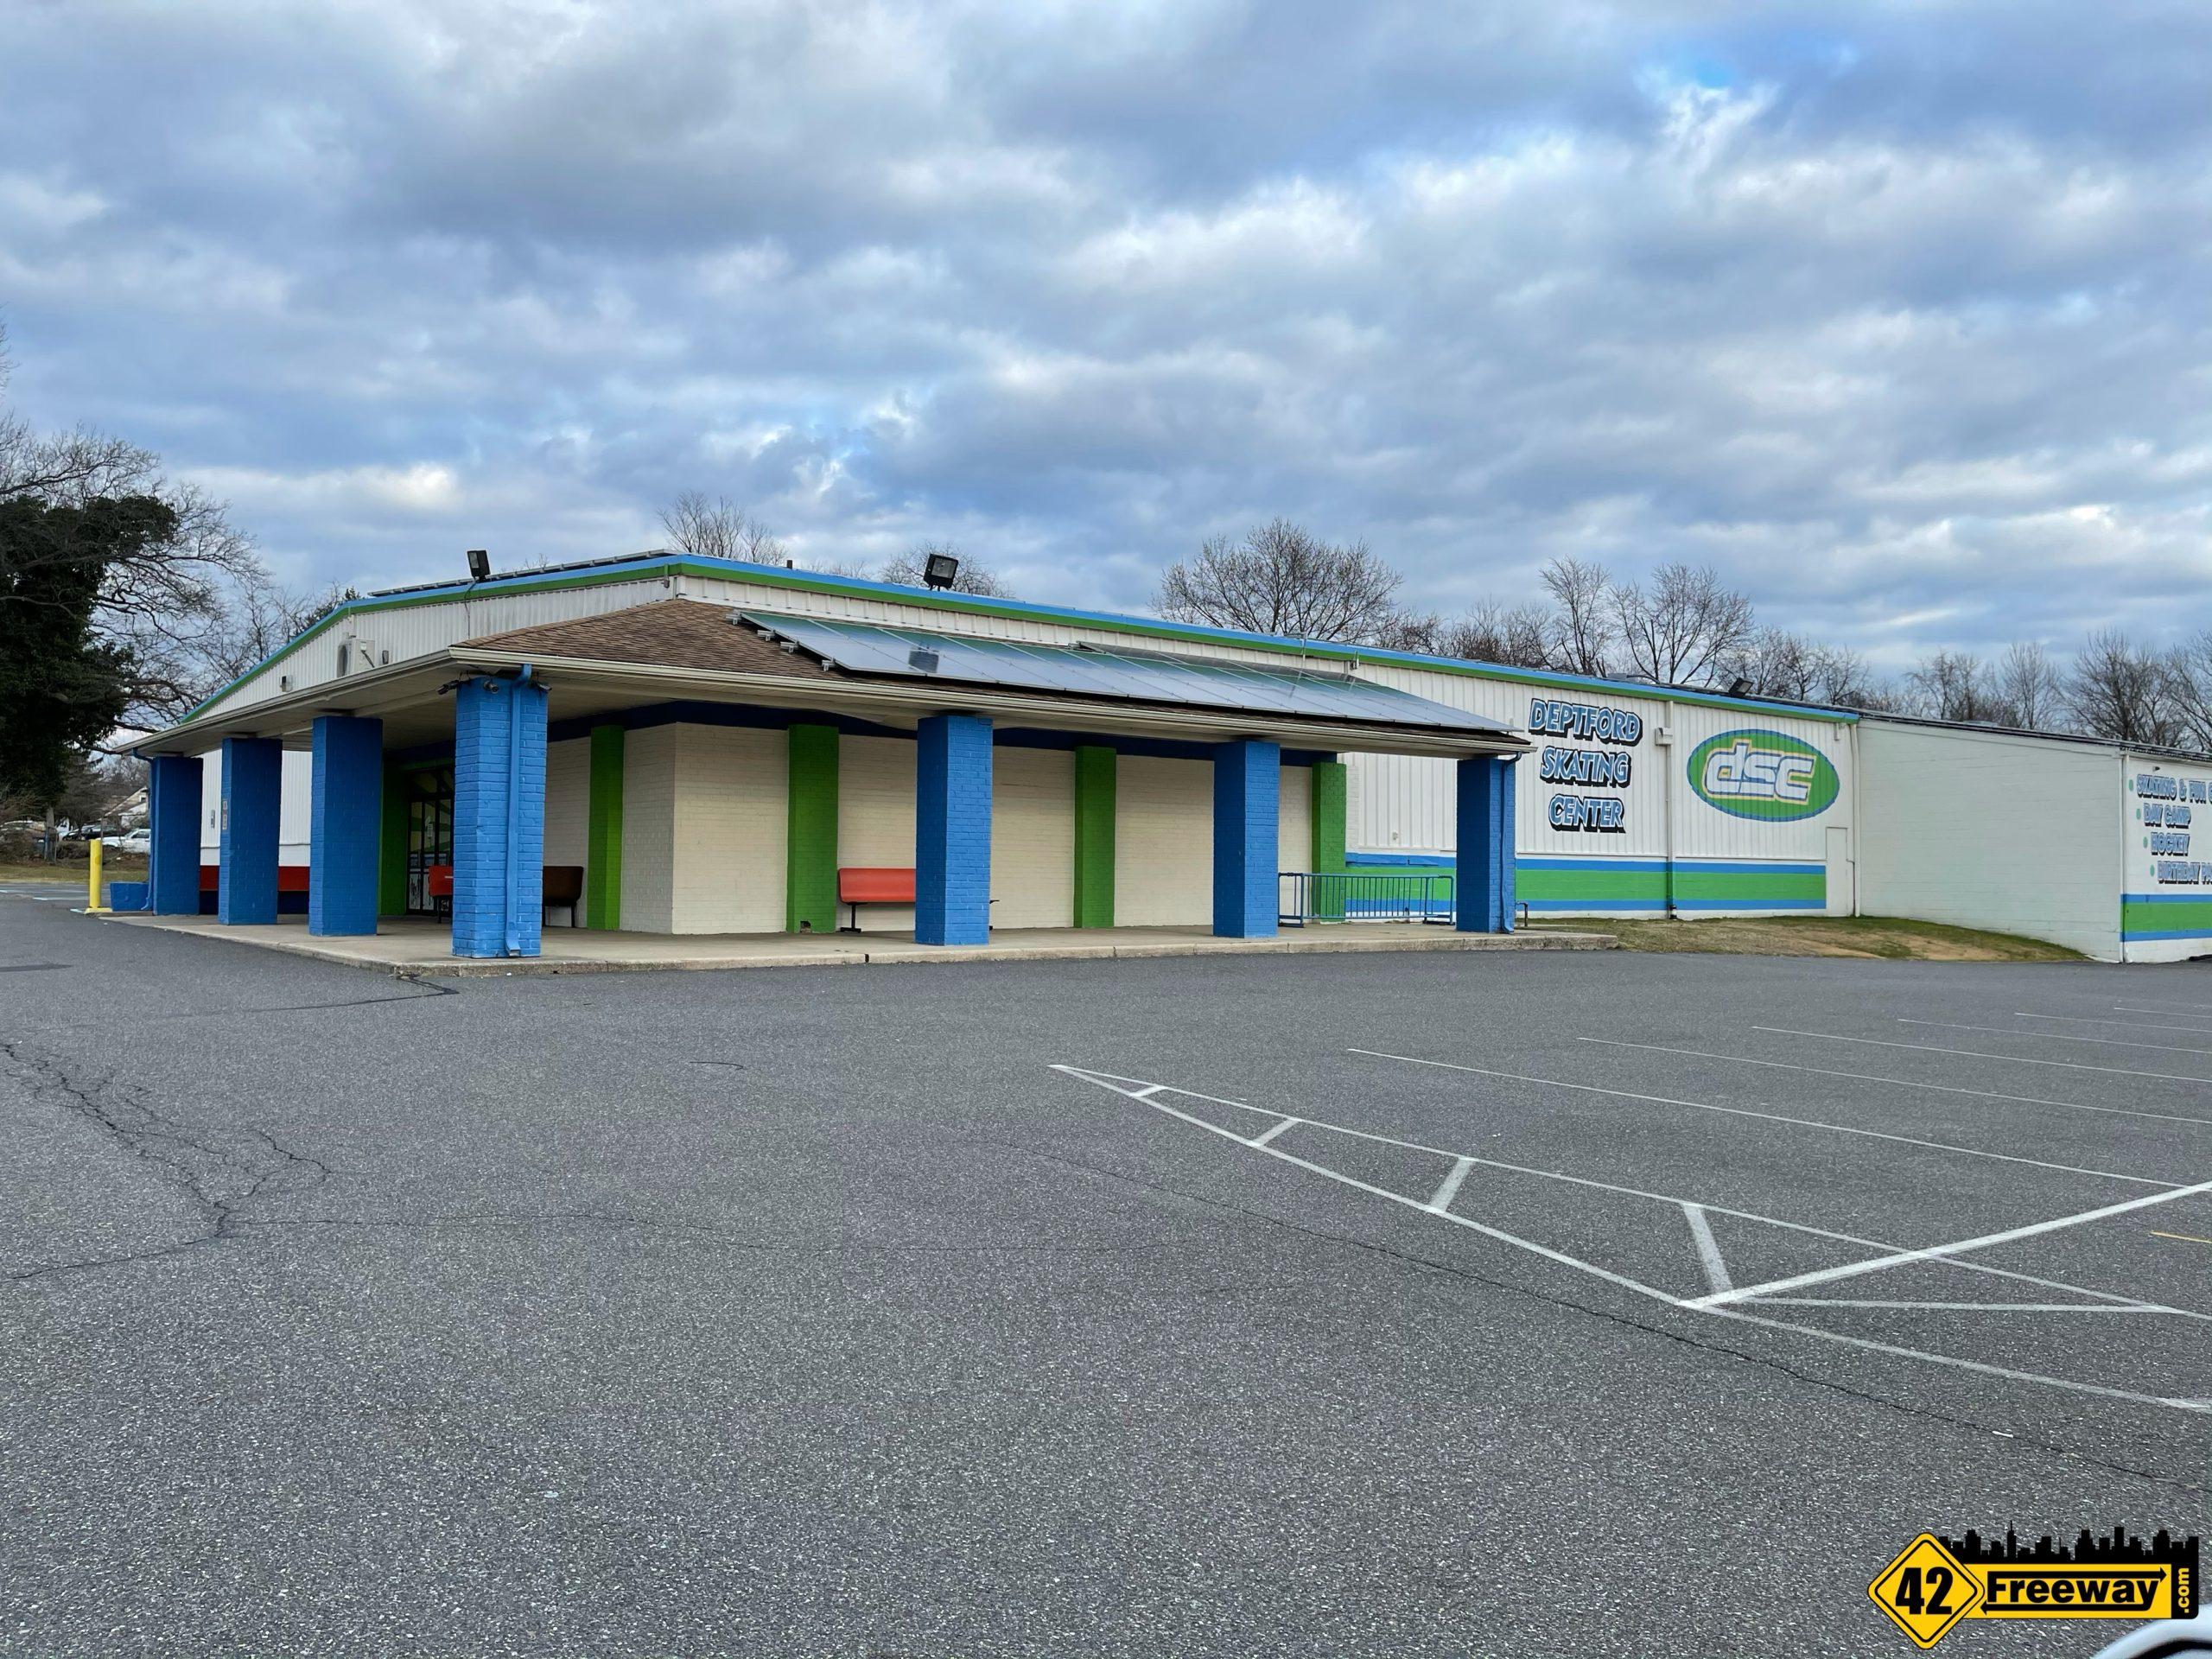 Deptford Skating Center Closing January 23rd After Generations of Fun